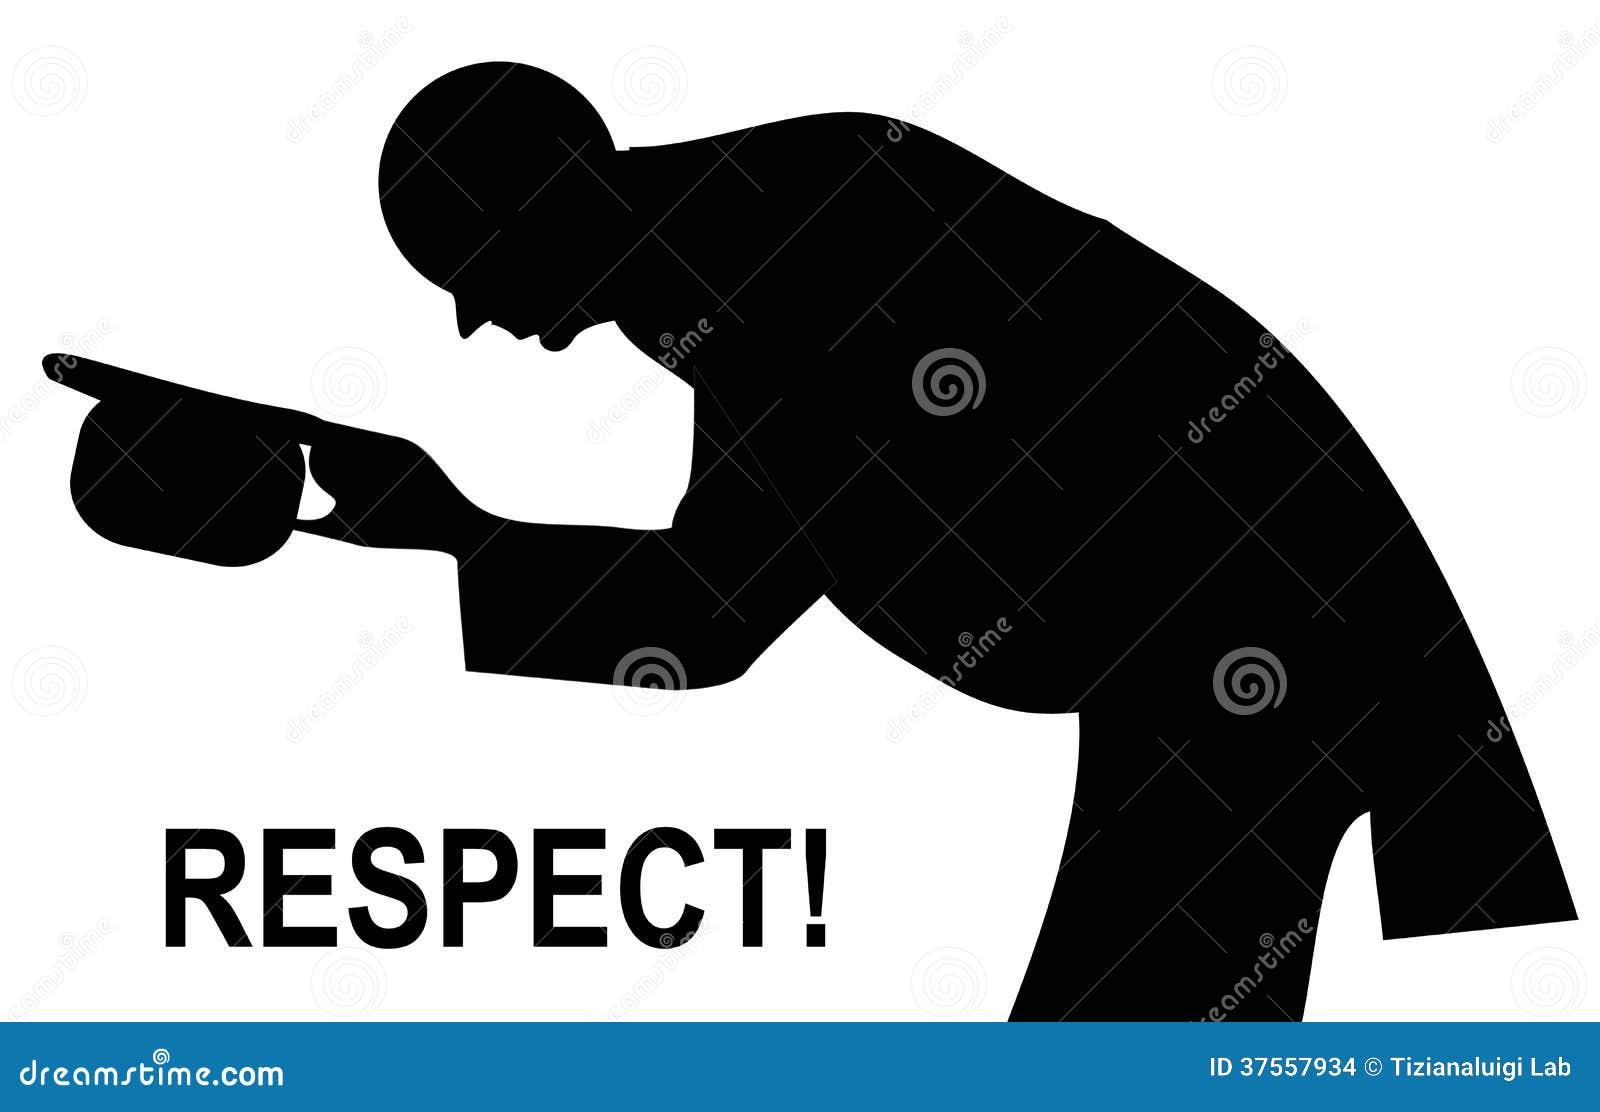 Respect stock illustration. Illustration of black, object ... Respect Hat Template